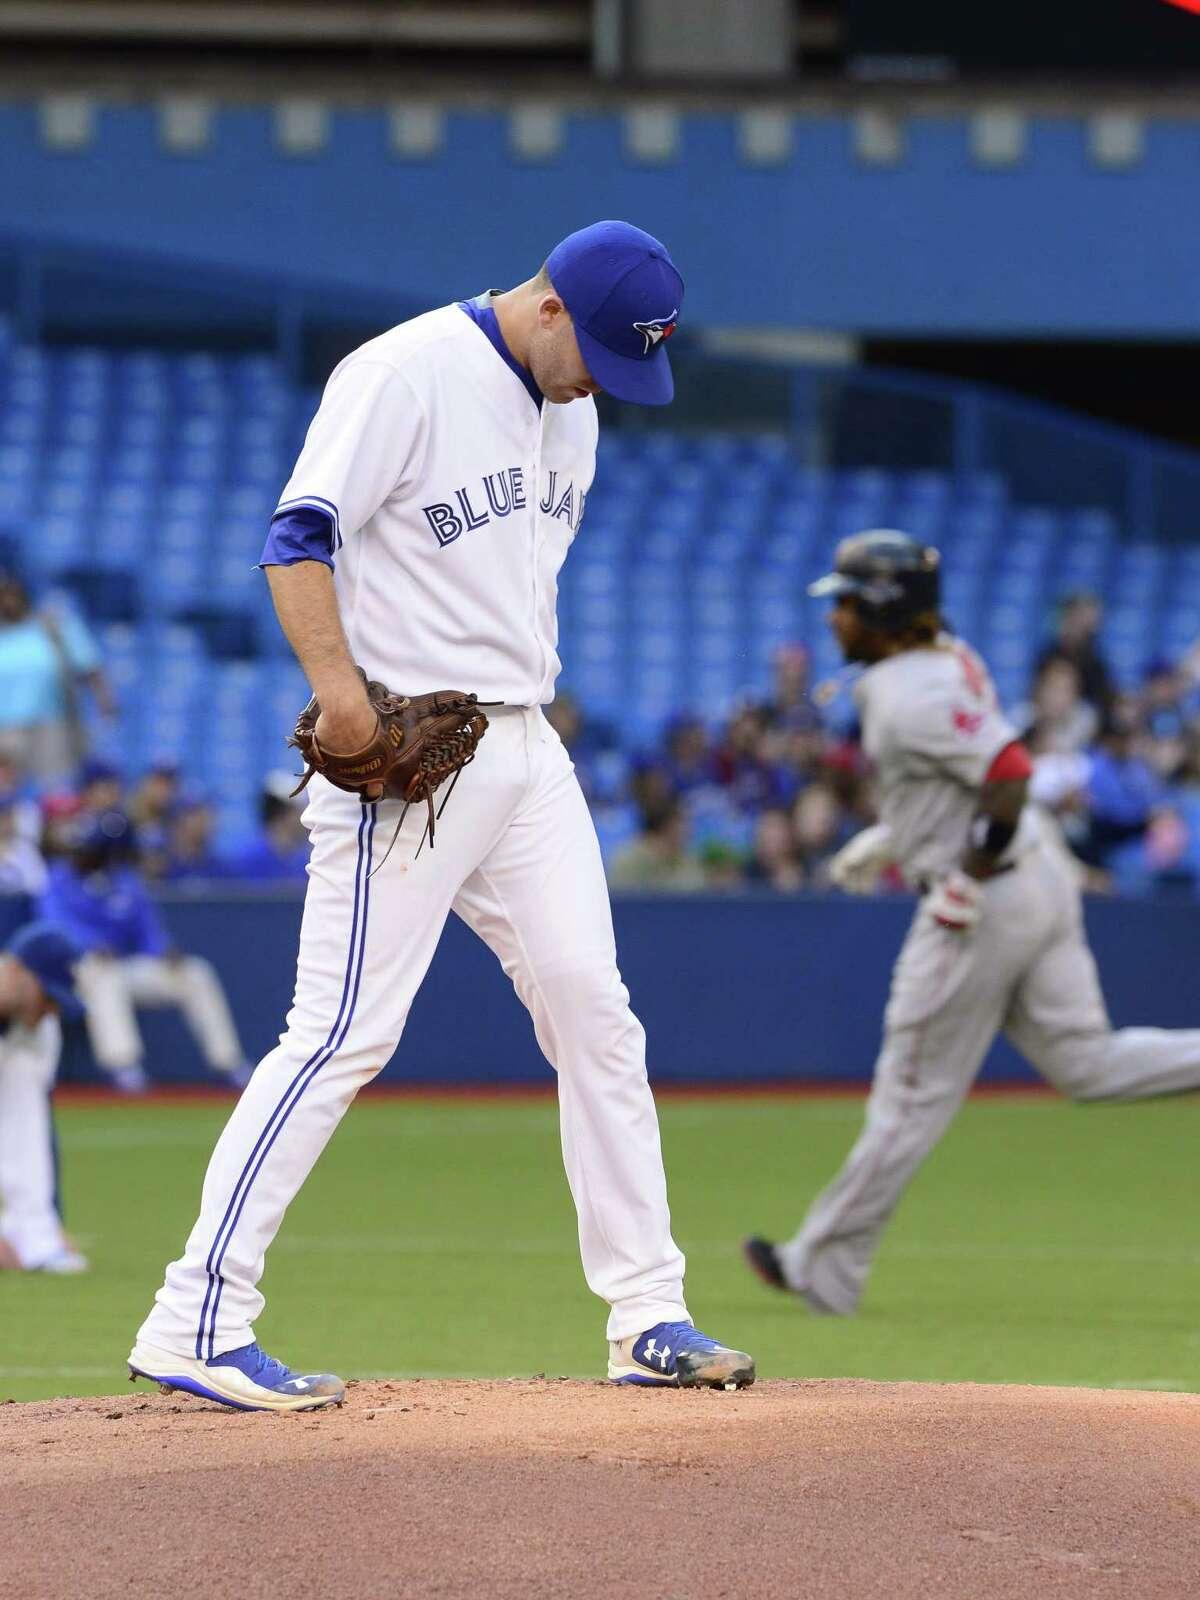 Toronto Blue Jays starting pitcher Matt Boyd gave up seven runs without recording an out on Thursday.